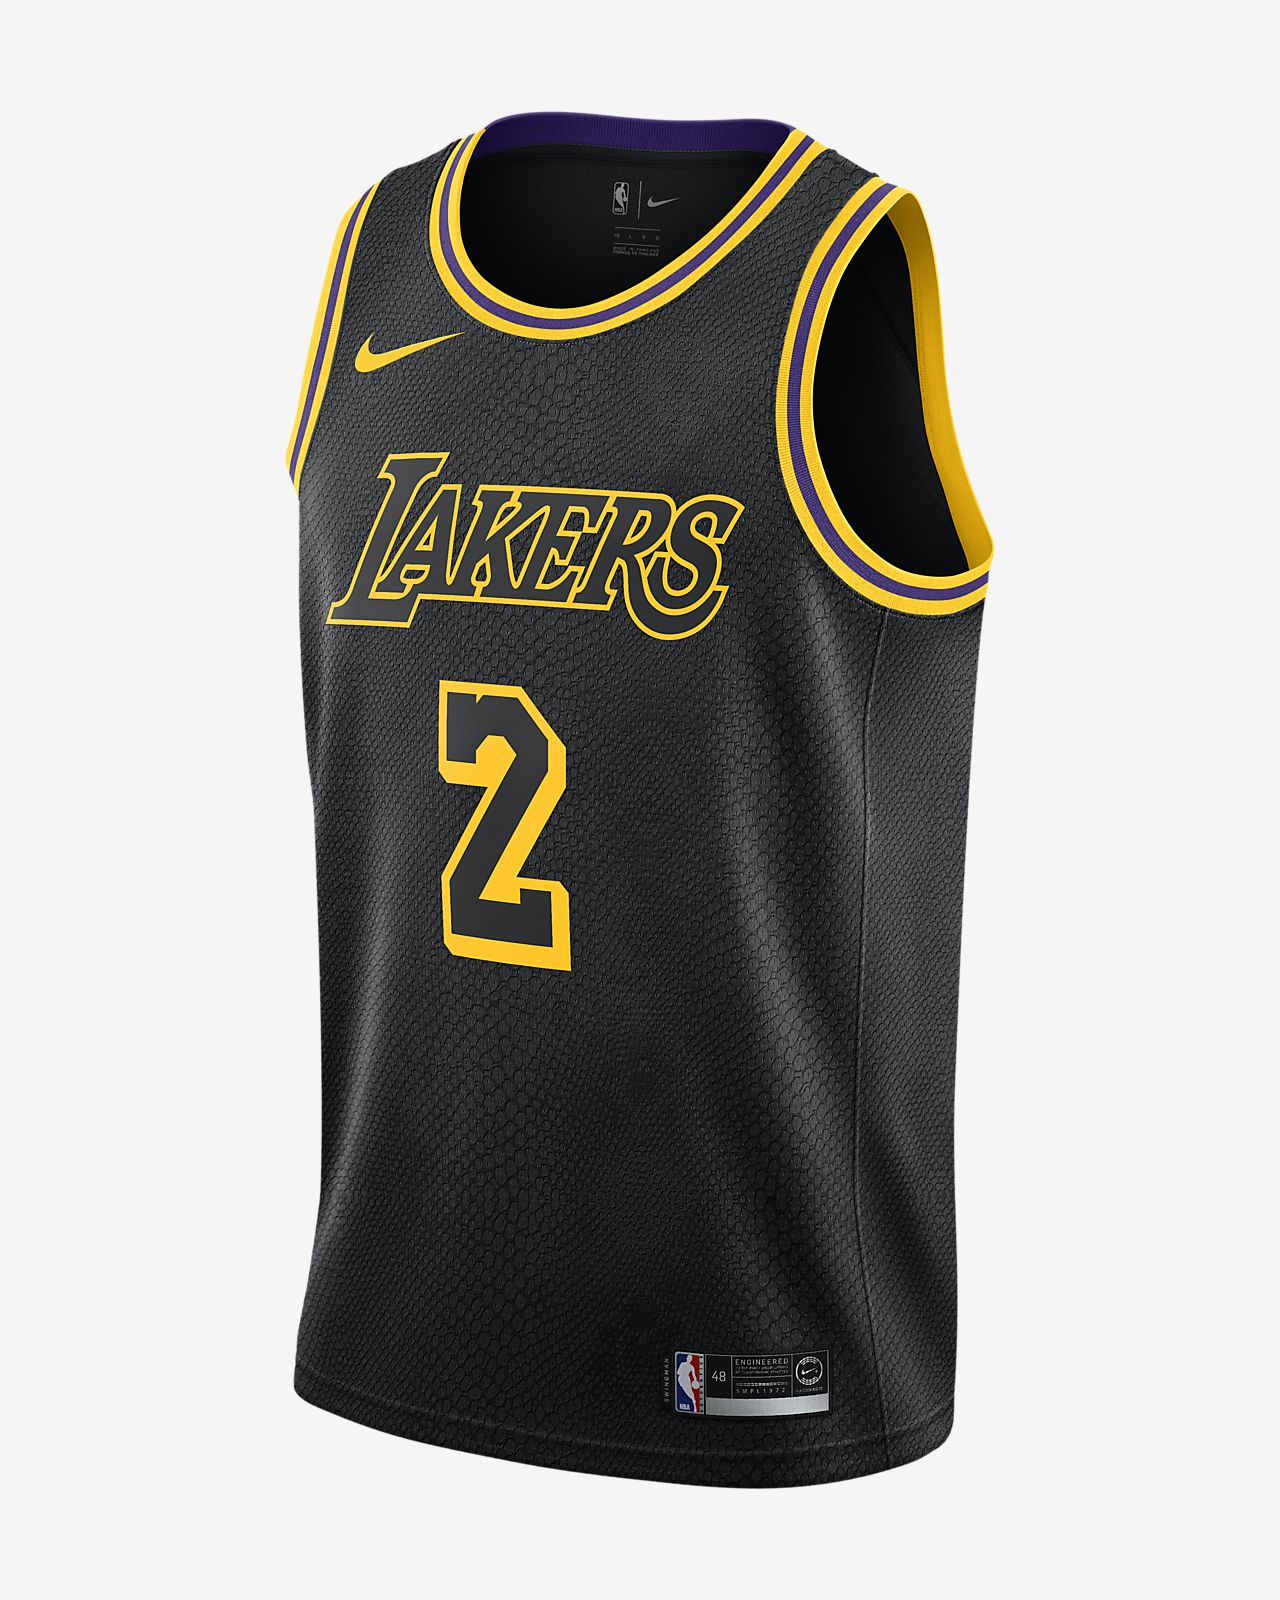 387105f17eb Lonzo Ball City Edition Swingman Jersey (Los Angeles Lakers) Men's Nike NBA  Jersey